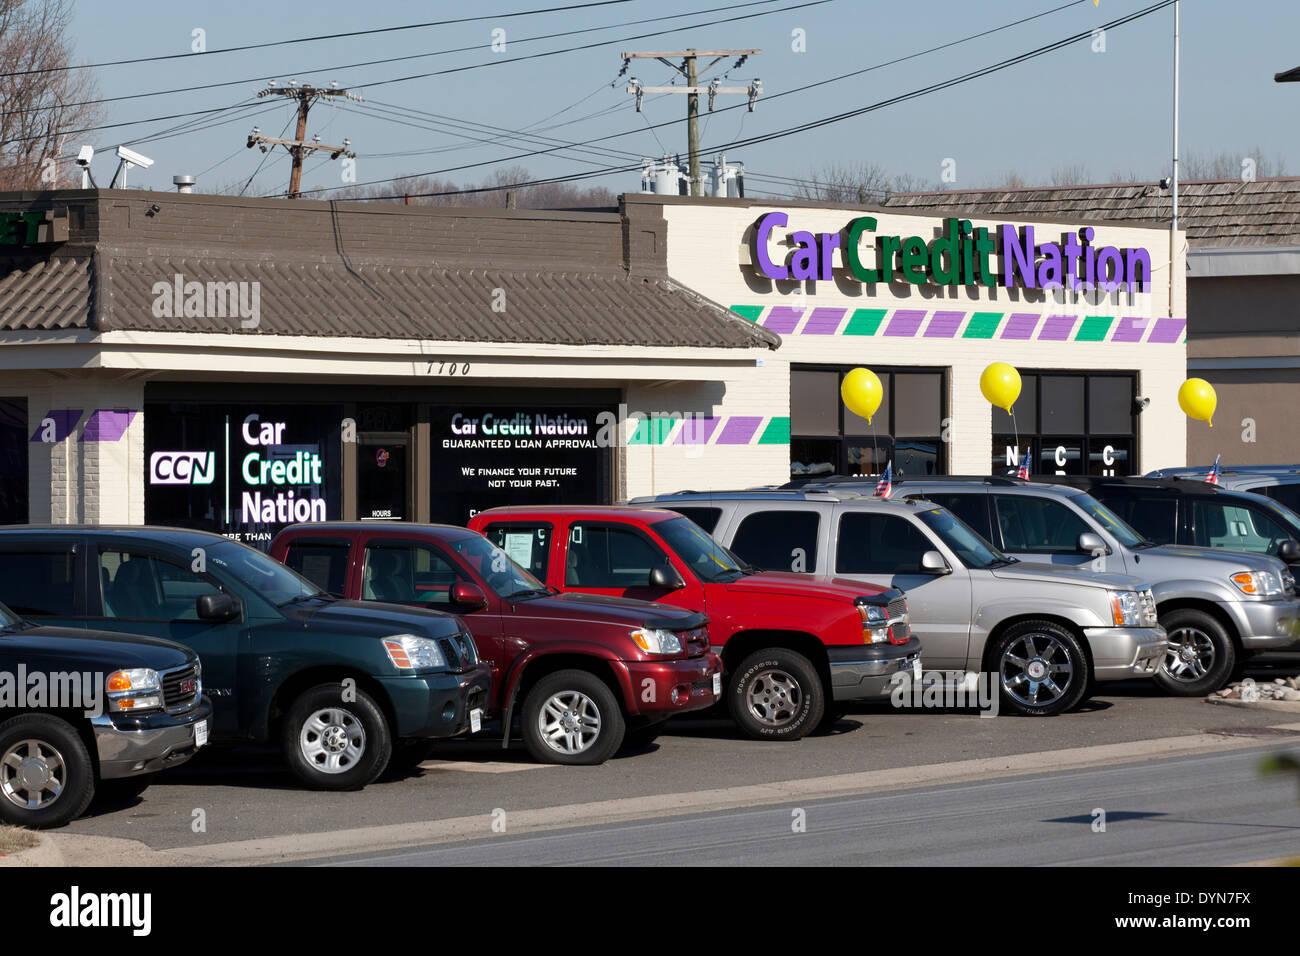 Car Credit Nation used car dealer - Falls Church, Virginia USA - Stock Image